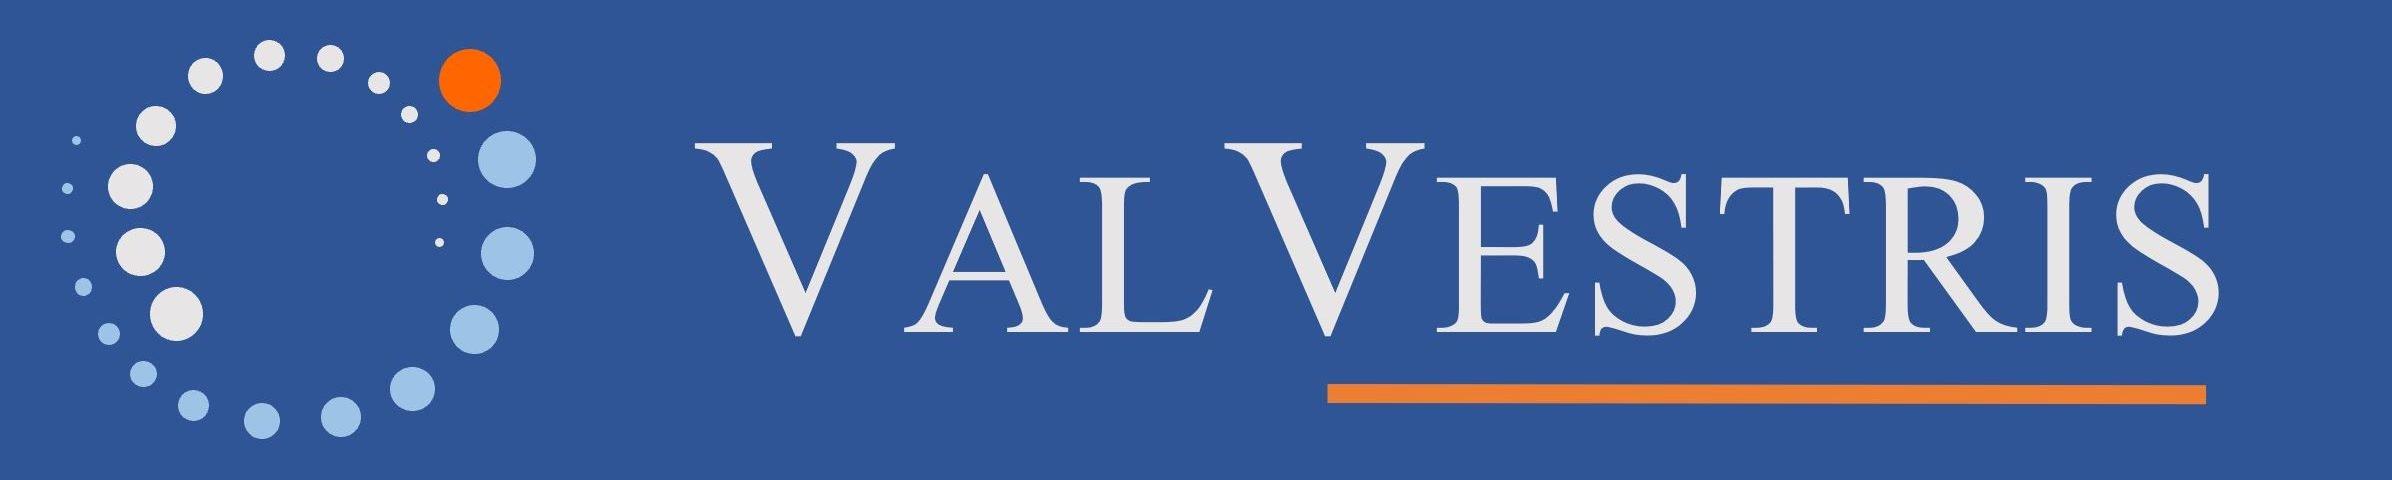 ValVestris Decision Support